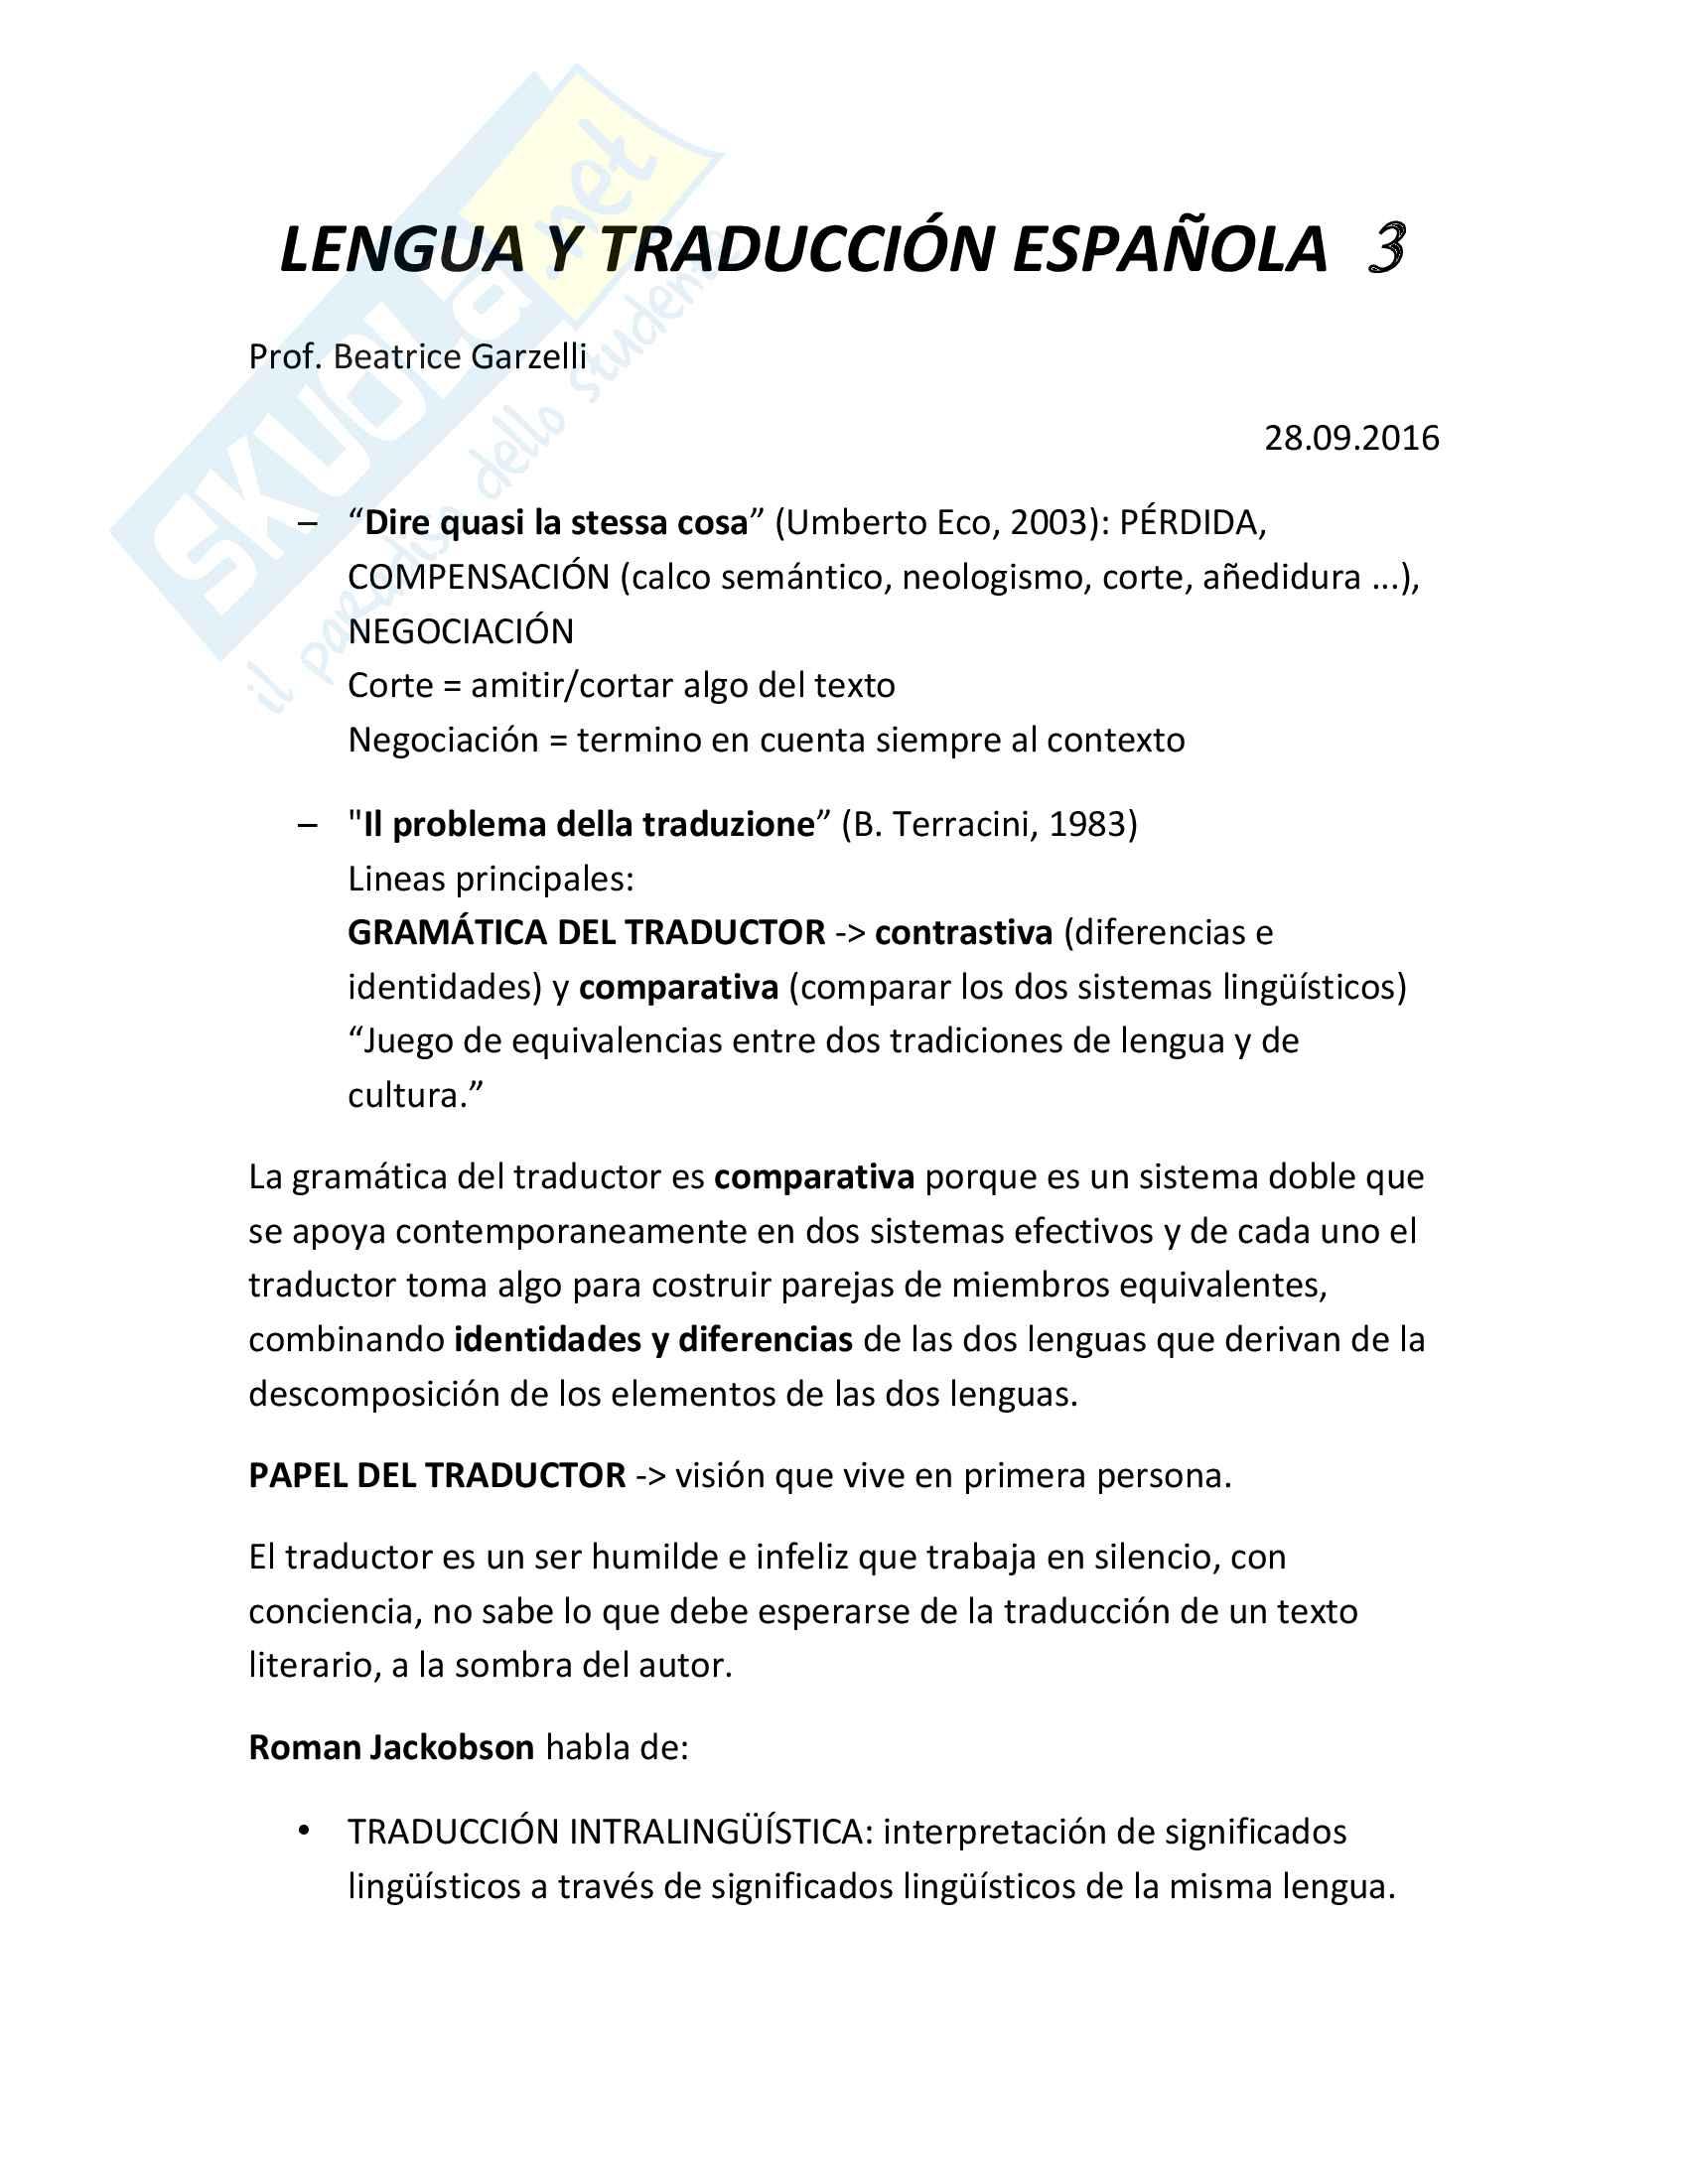 Appunti esame Lingua e traduzione spagnola III, prof. Garzelli